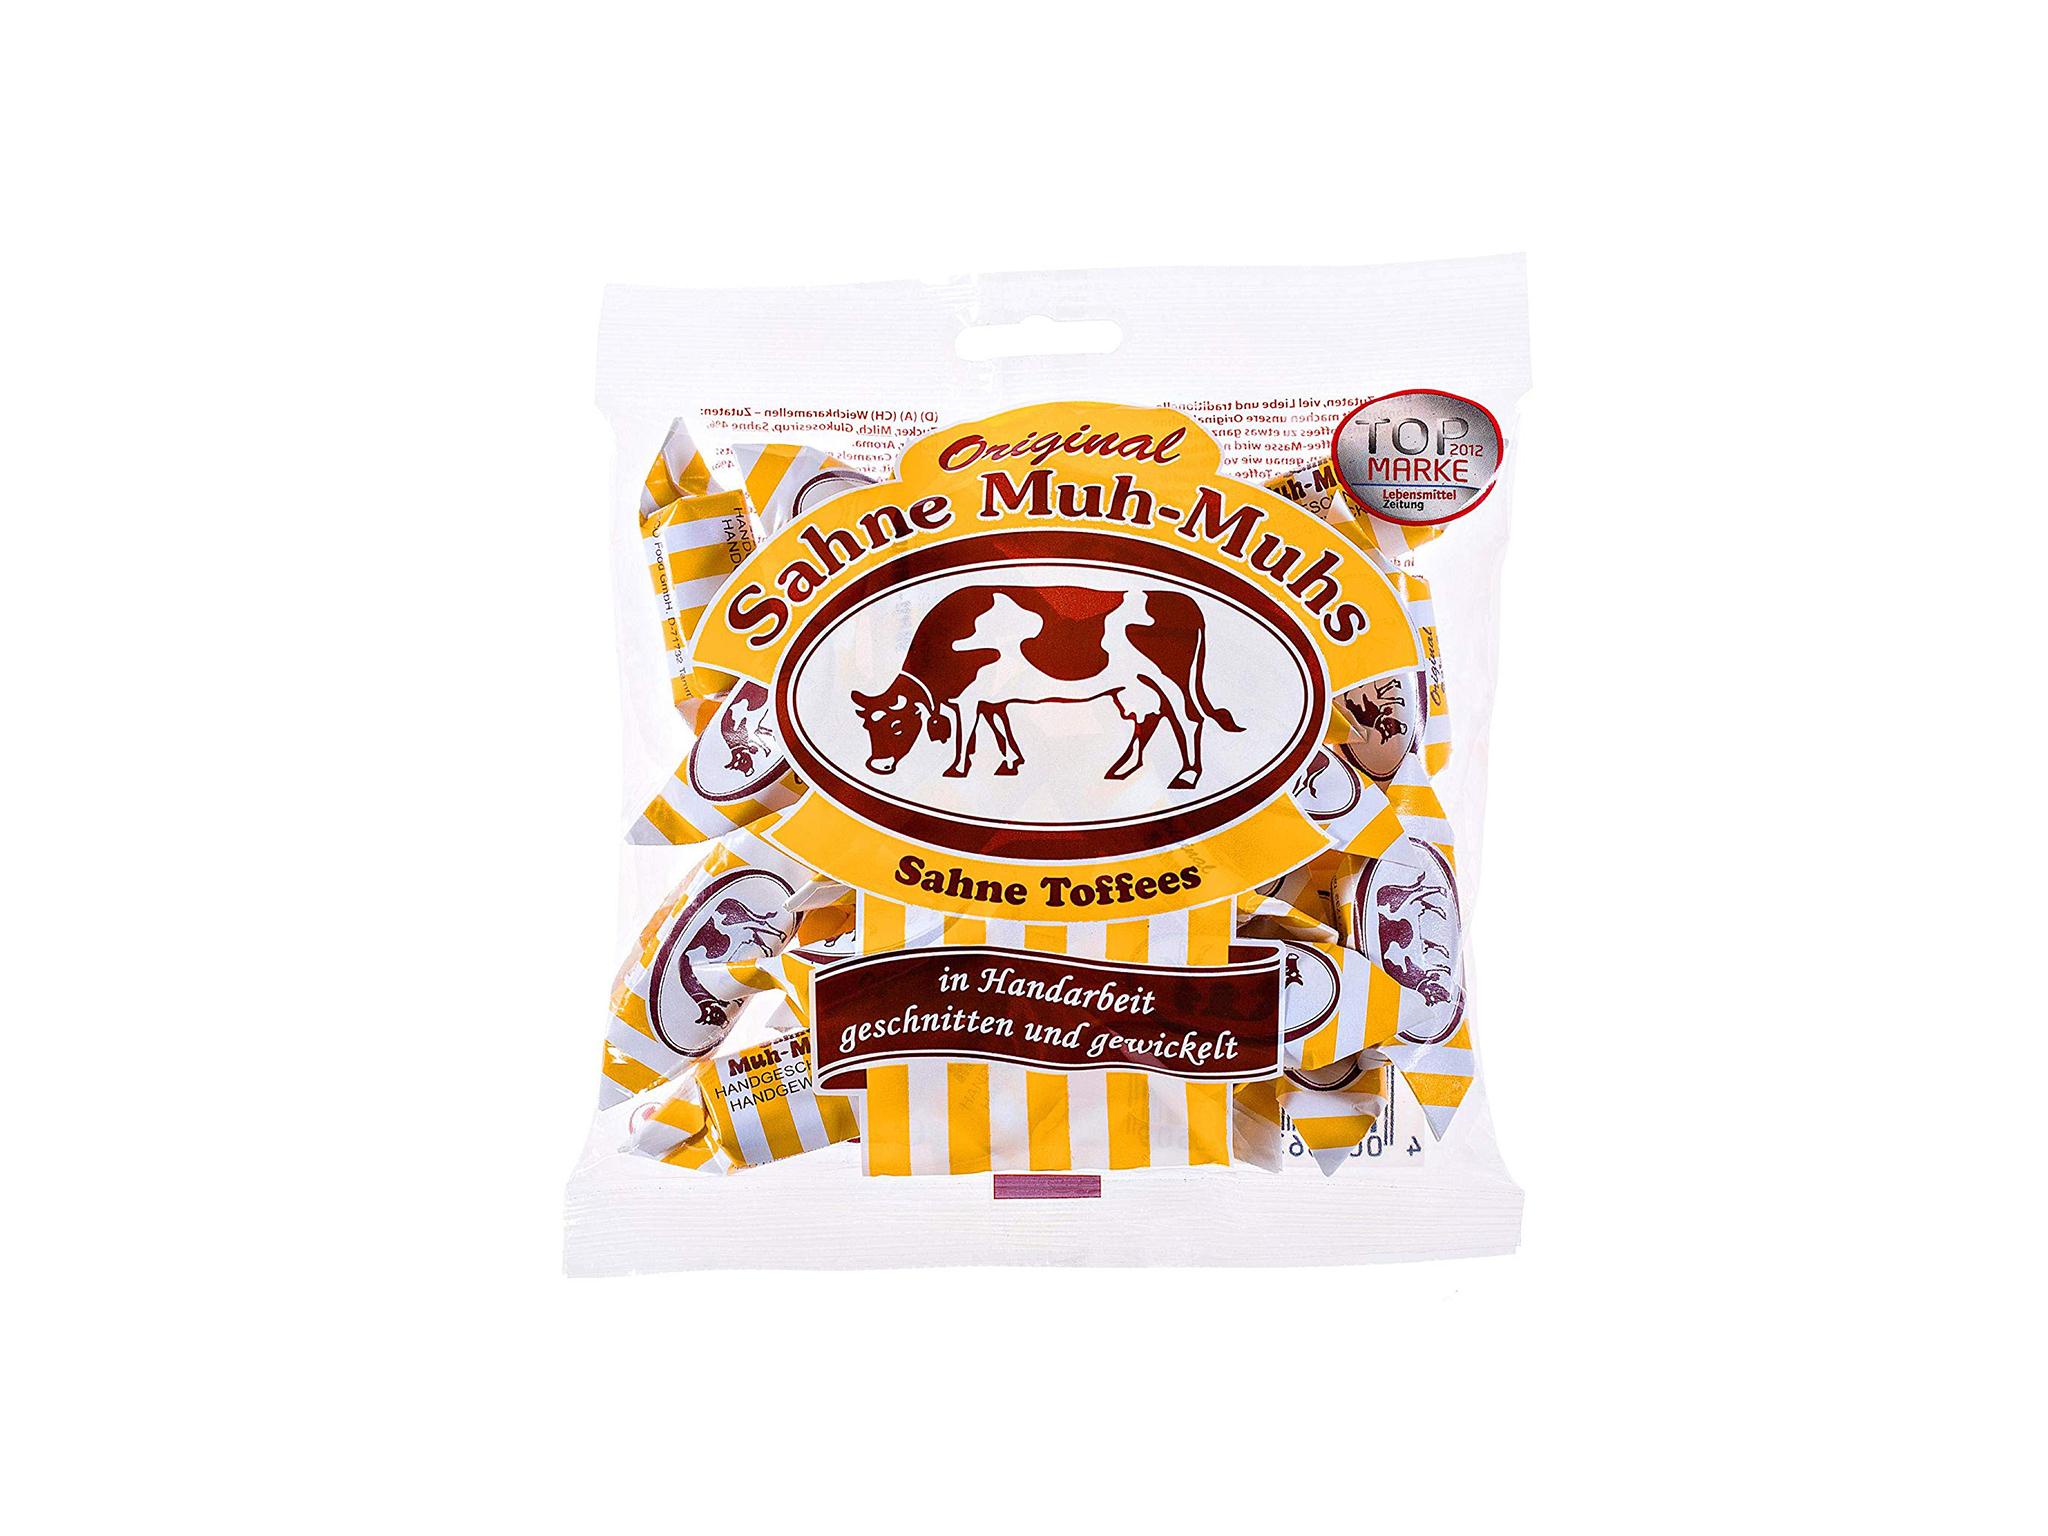 Doces, Original Sahne Muh-Muhs